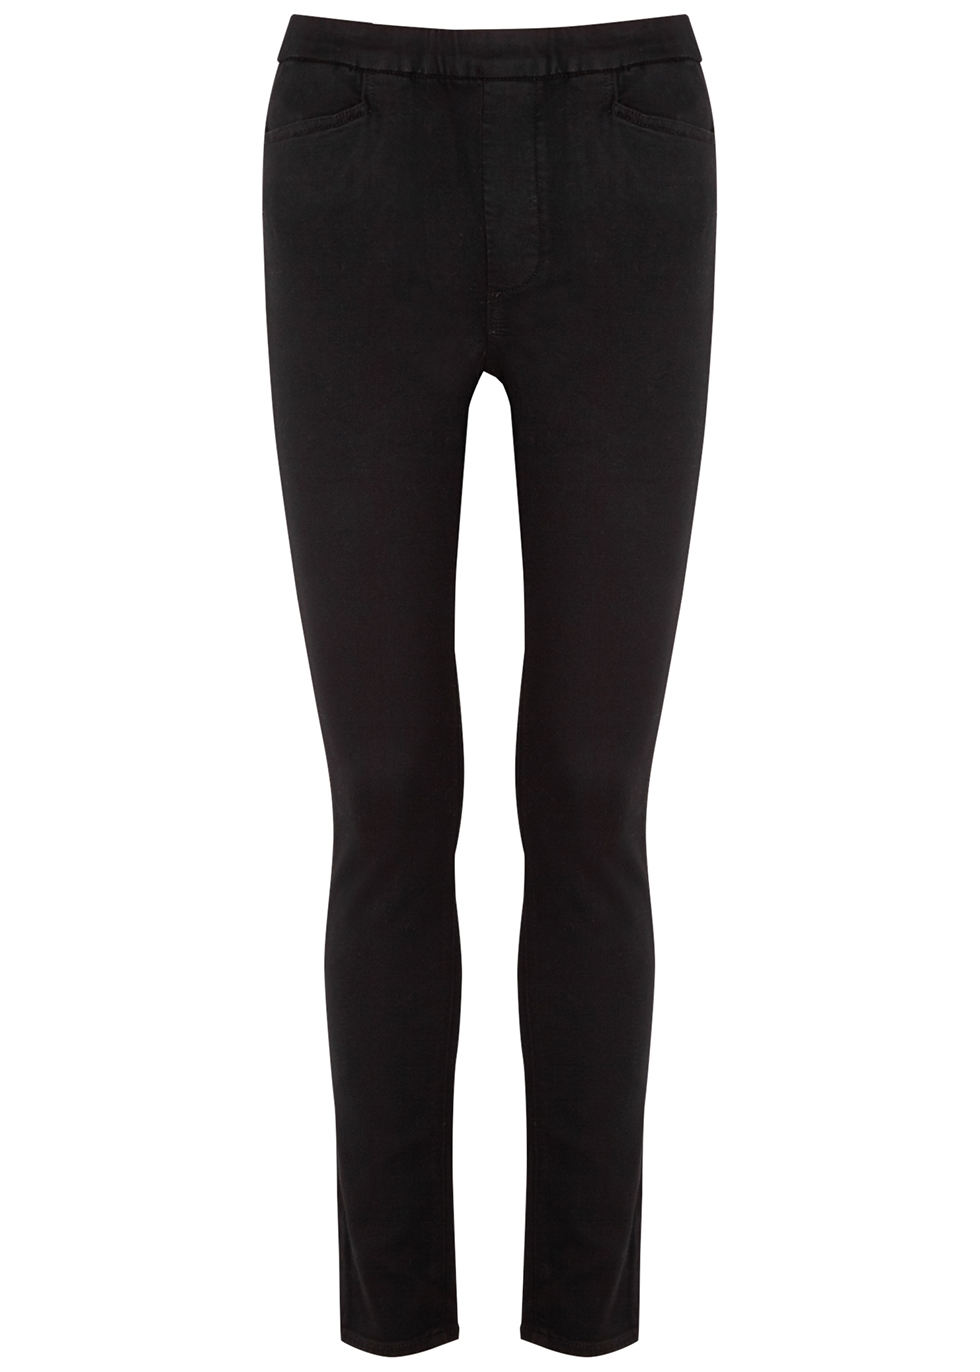 Hoxton Transcend black stretch-denim leggings